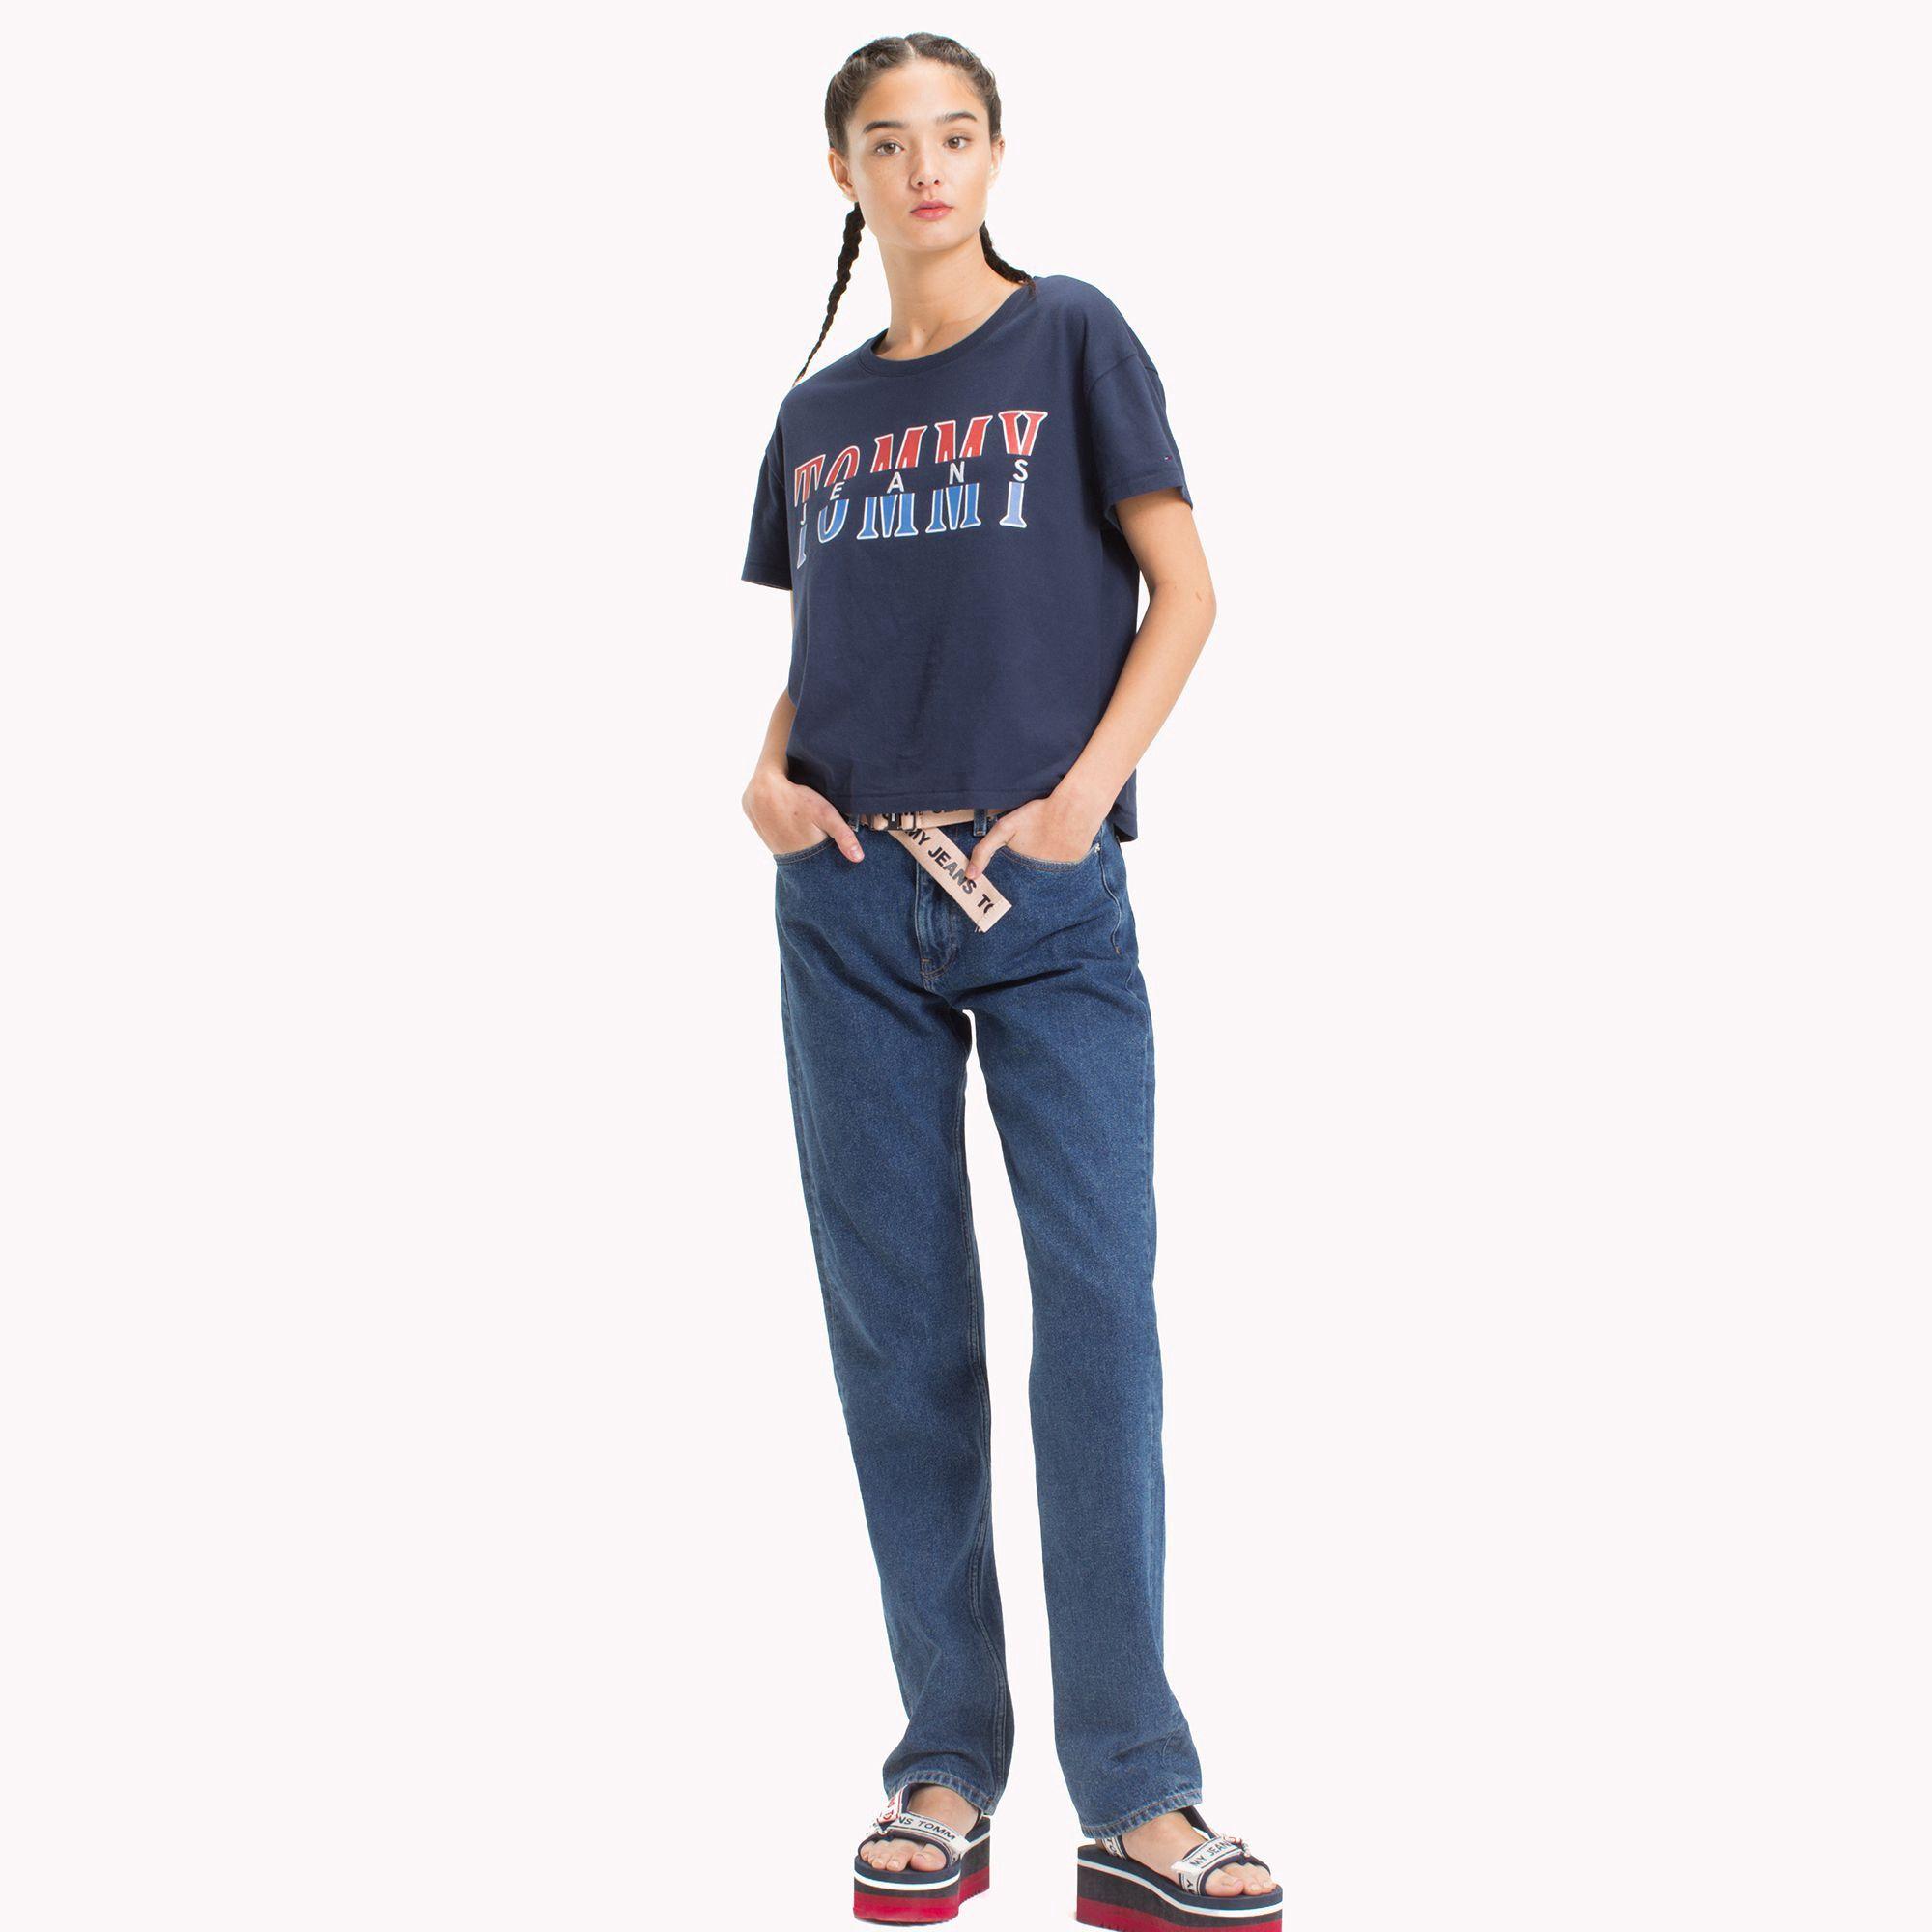 21d114f4d Tommy Hilfiger Retro Logo T-Shirt - Butterscotch Xl   Products ...